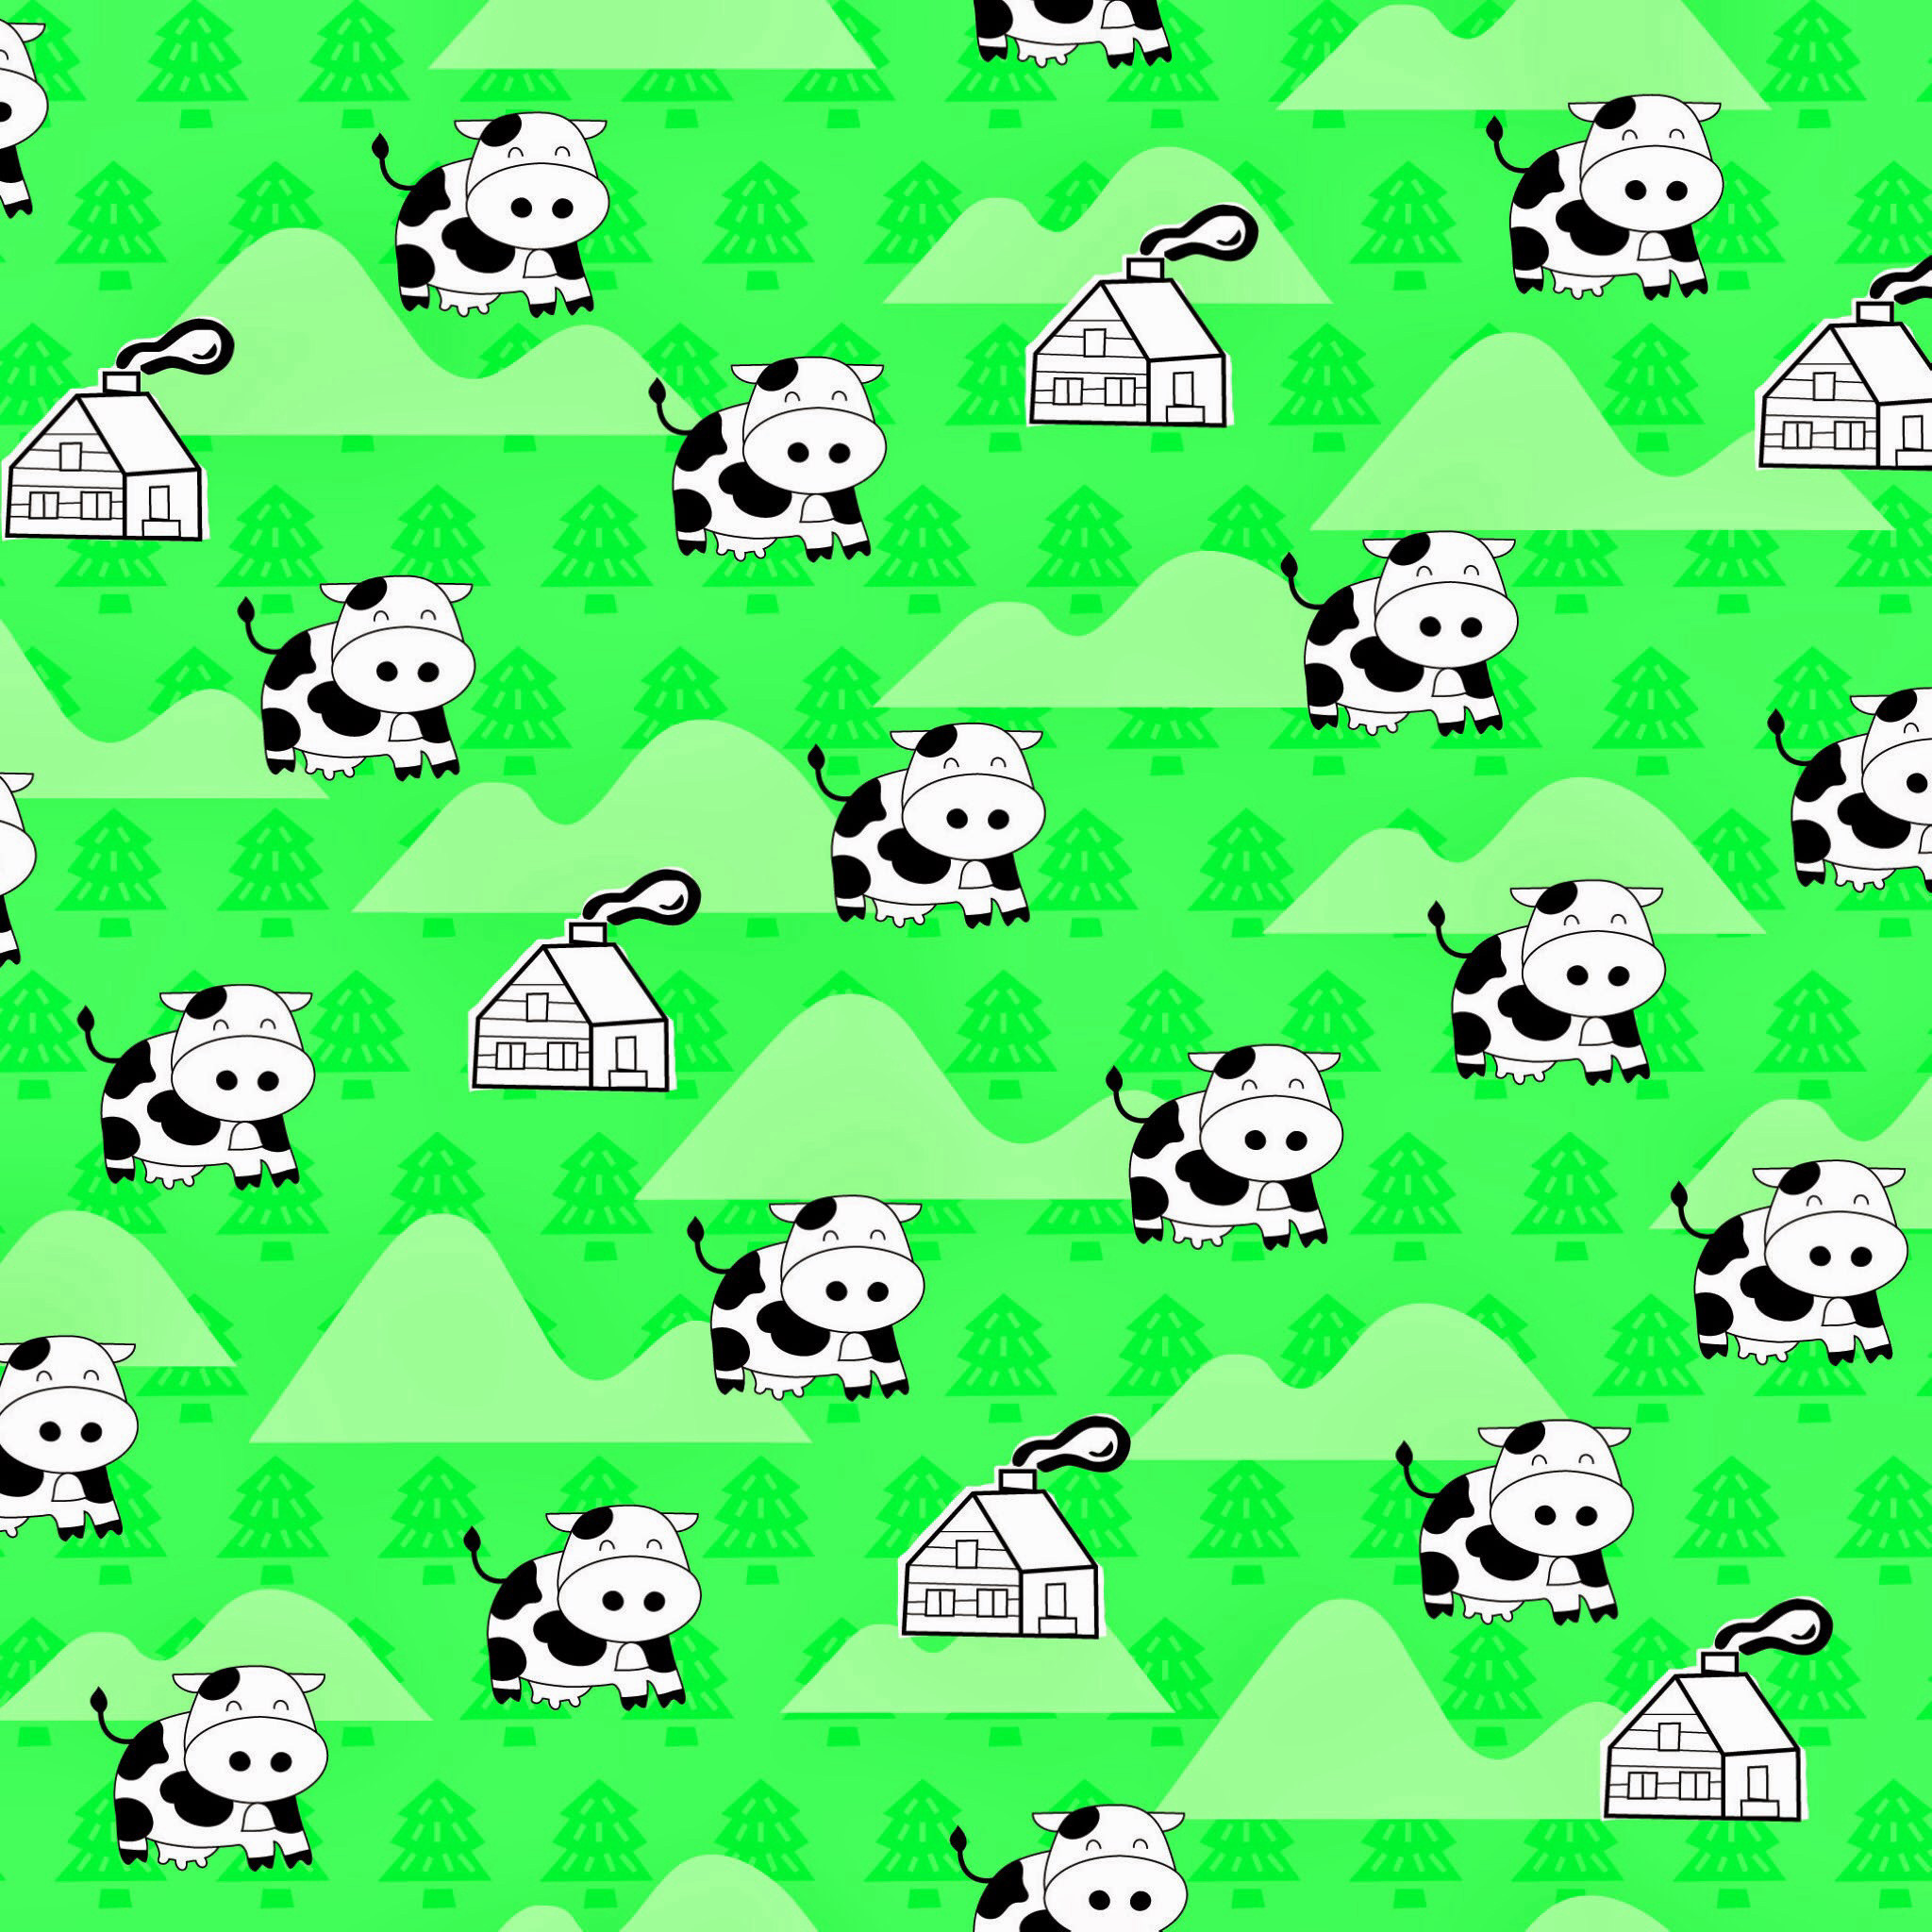 Cute Cow Wallpaper ·① WallpaperTag